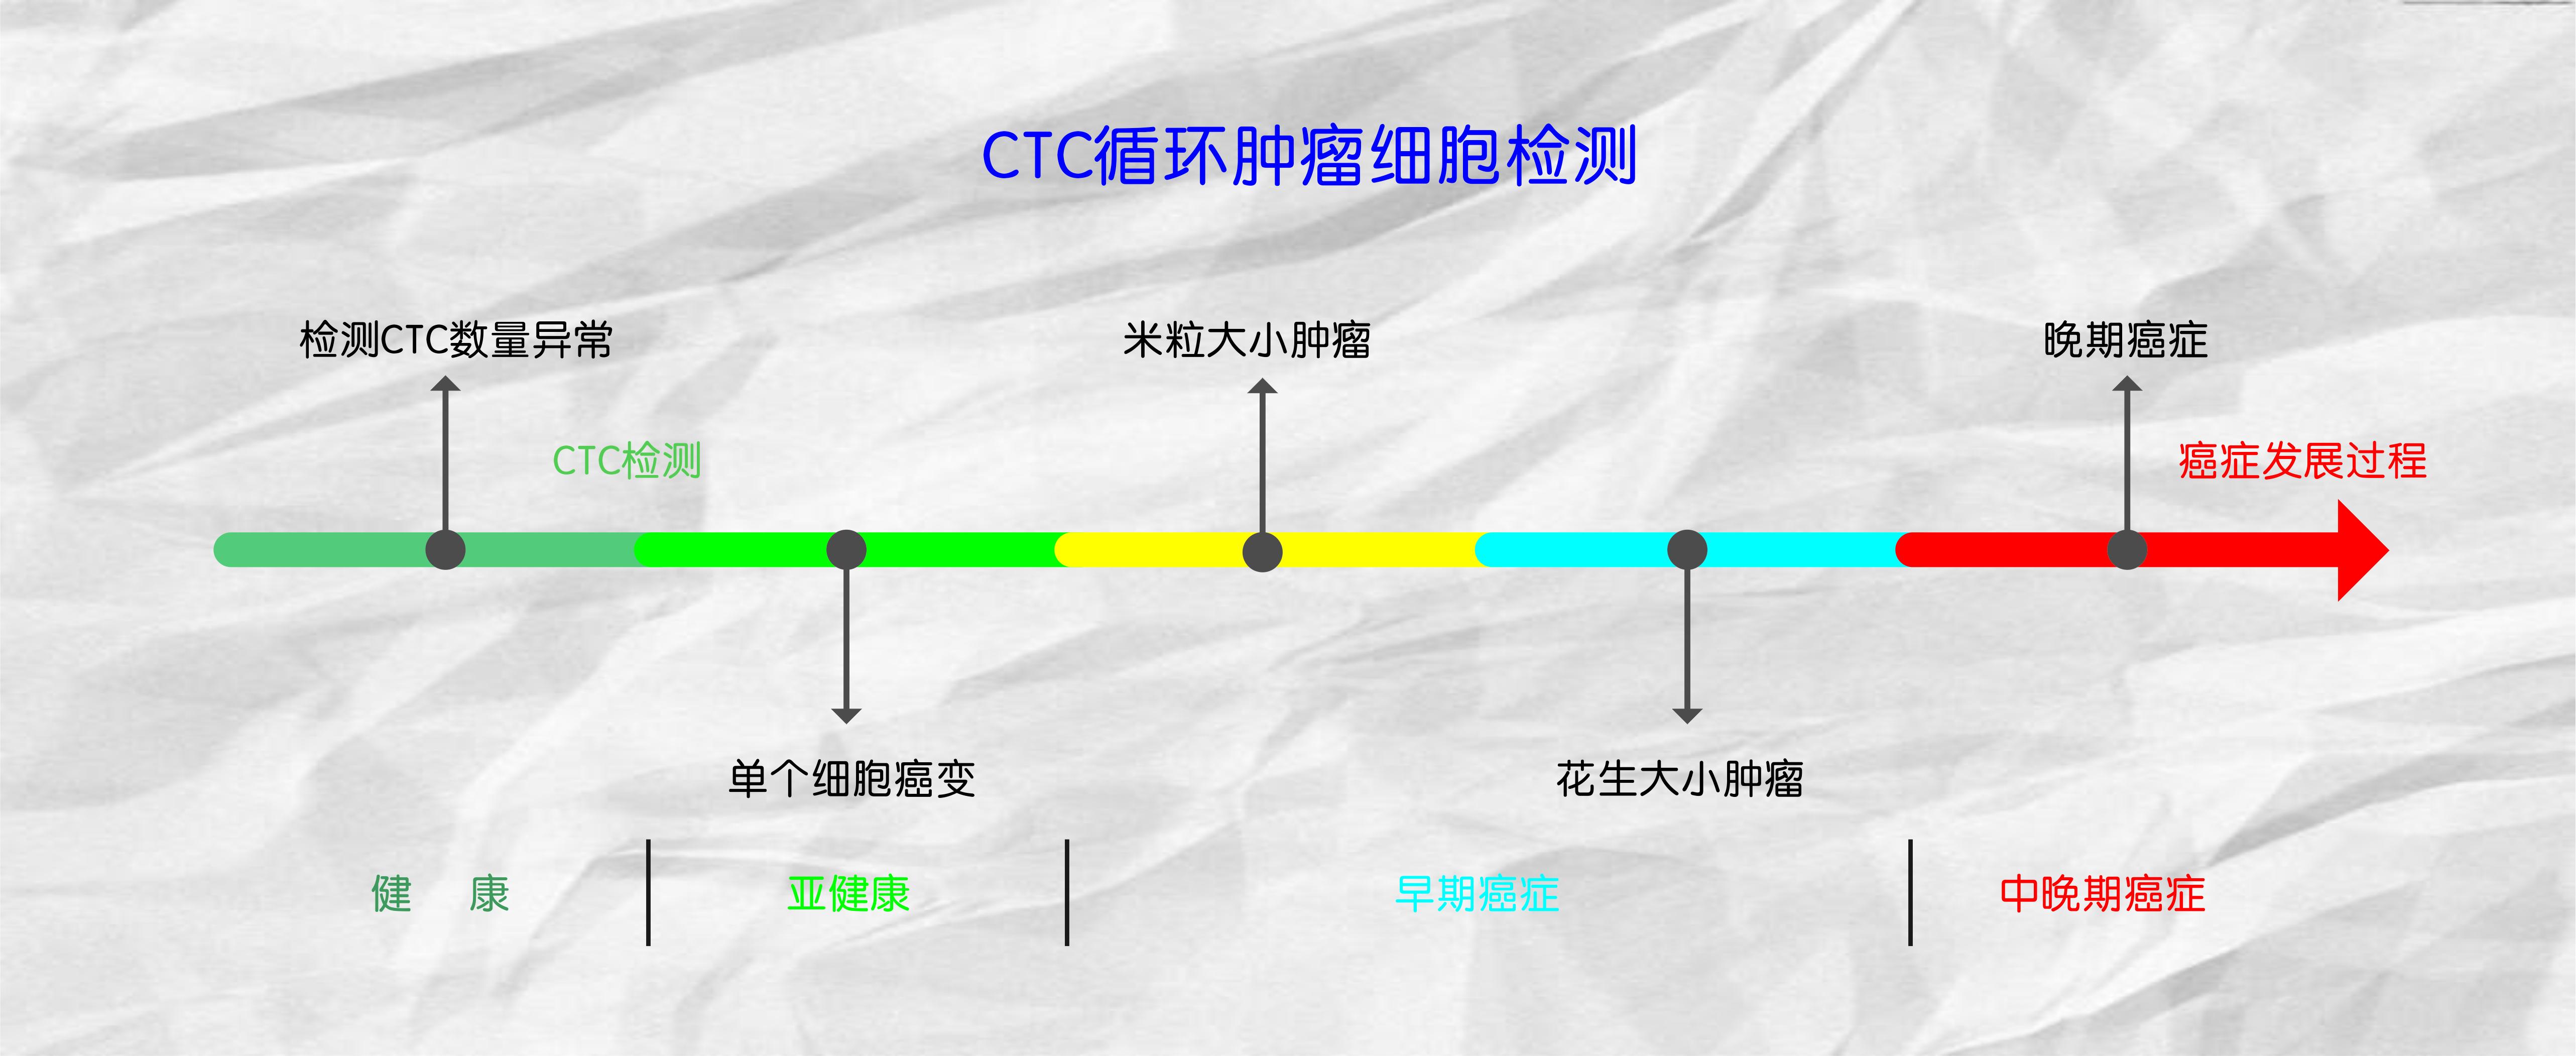 timg.jpg插图(1)